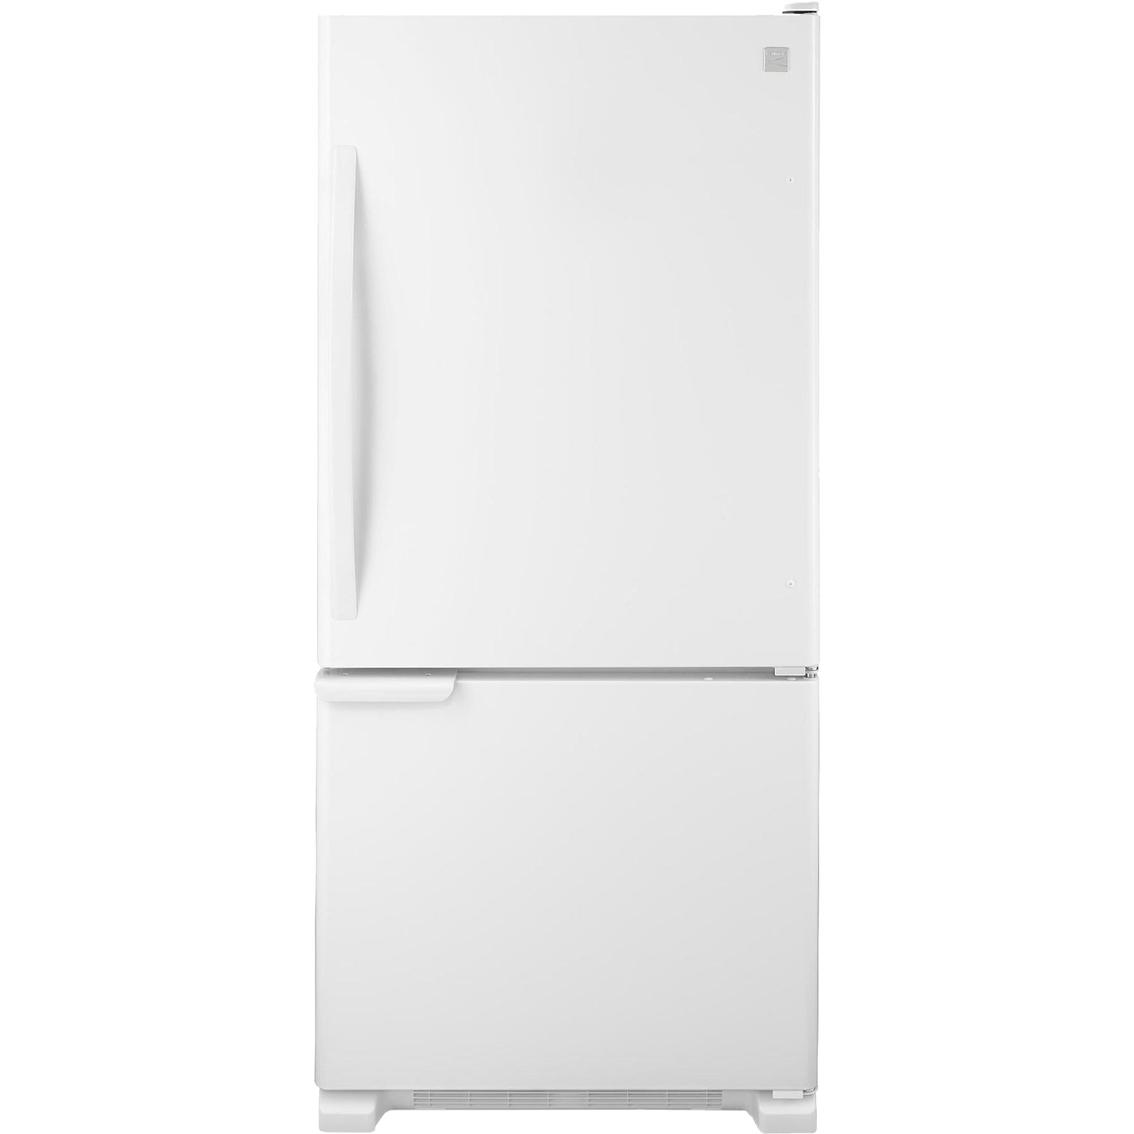 kenmore 19 cu ft bottom freezer refrigerator refrigerators home appliances shop the. Black Bedroom Furniture Sets. Home Design Ideas